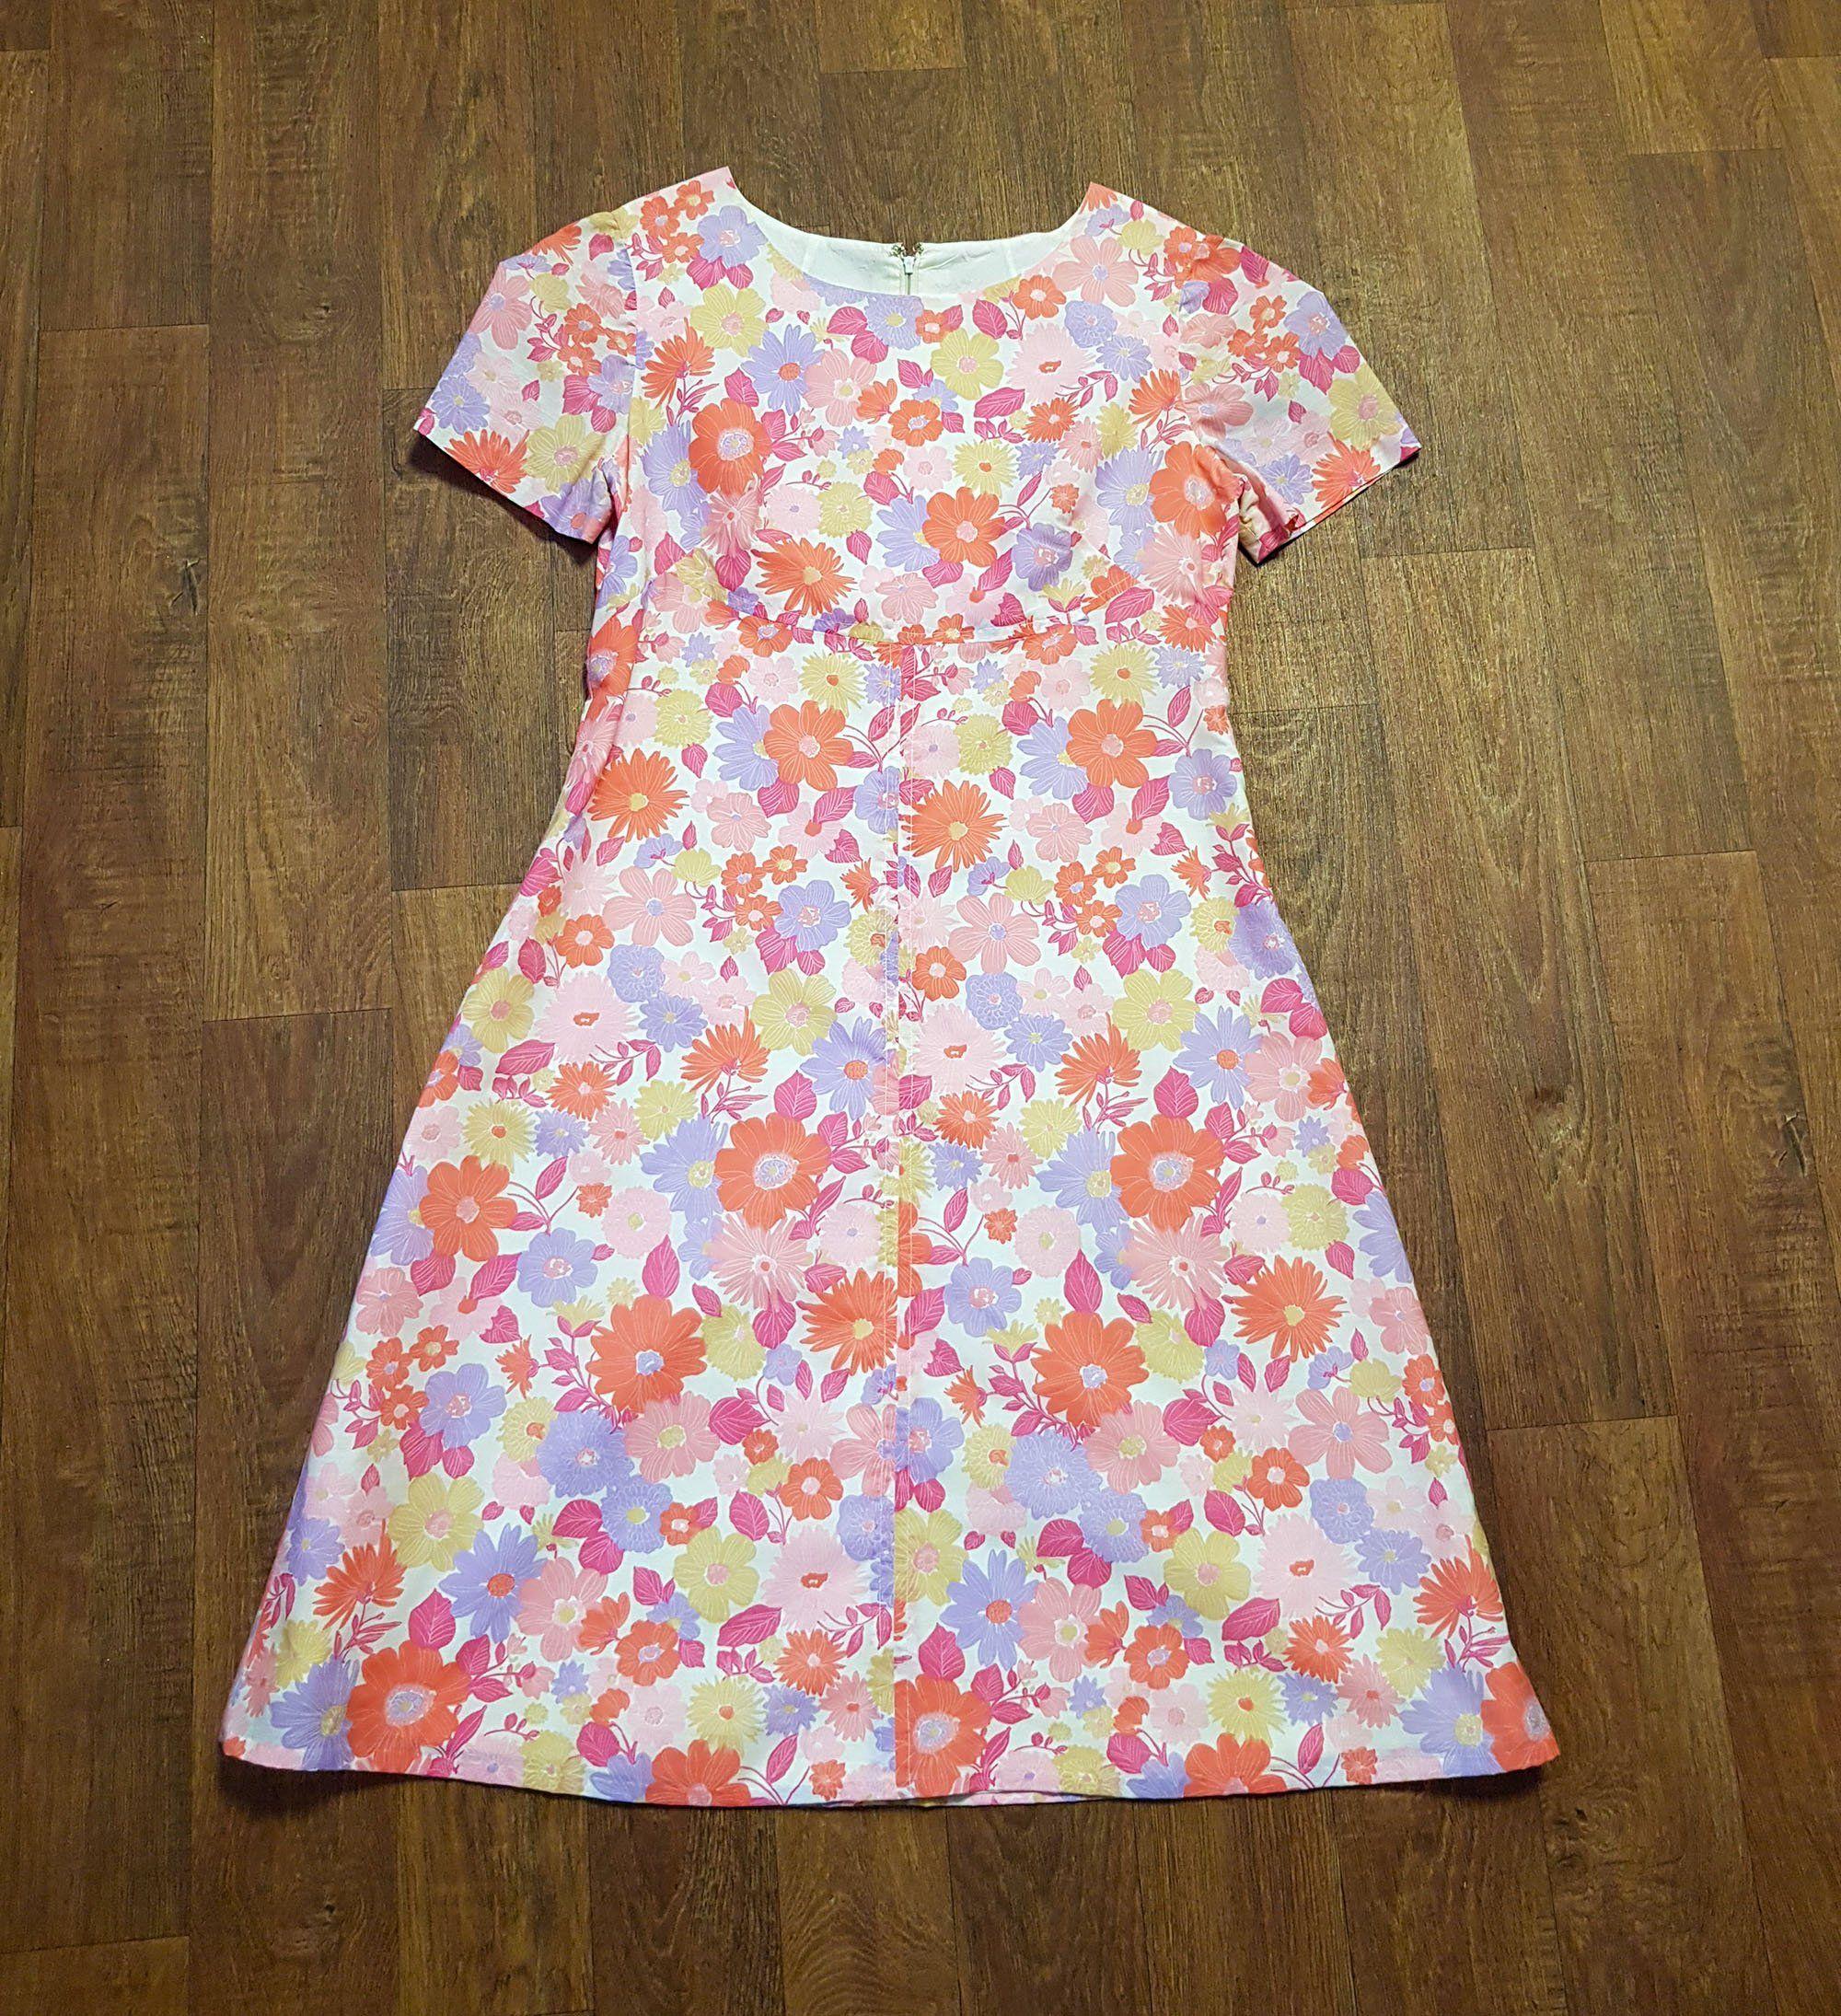 1960s Vintage Pastel Floral Shift Dress Uk Size 16 Vintage Dresses Vintage Shift Dress Floral Shift Dress 1960s Shift Dress [ 2190 x 2000 Pixel ]